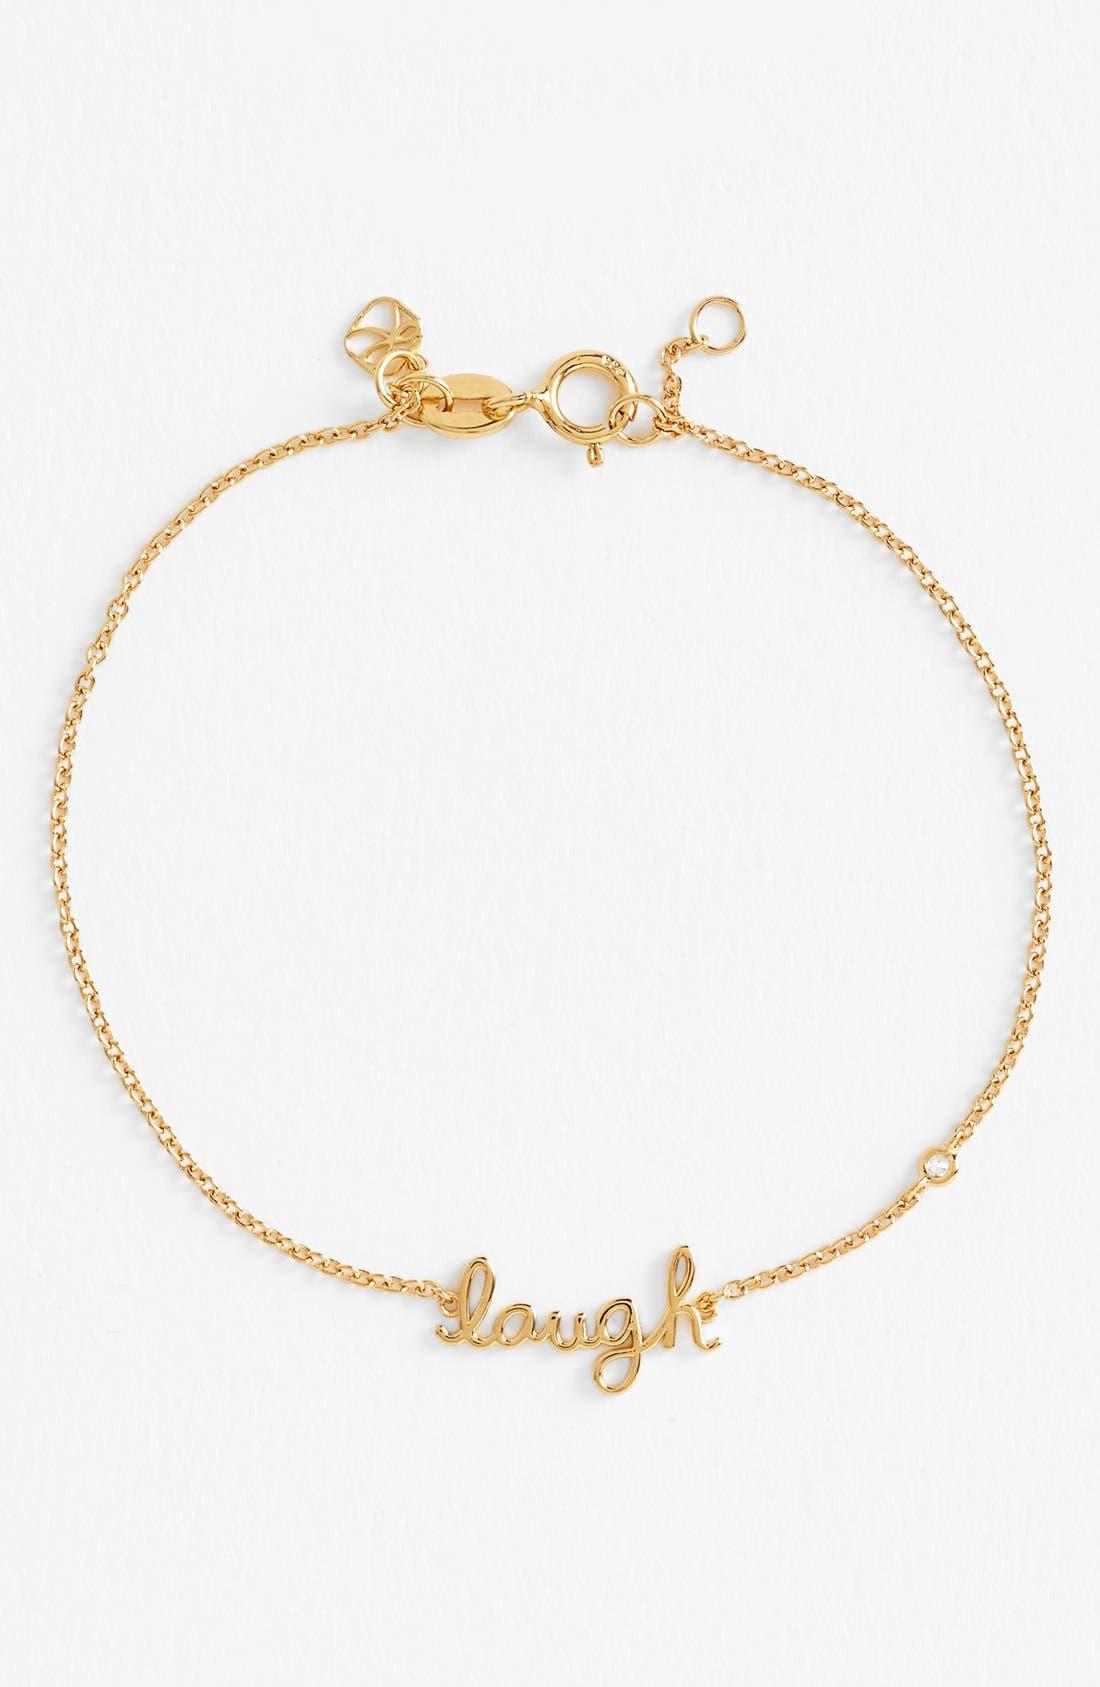 Main Image - SHY by Sydney Evan 'Laugh' Bracelet